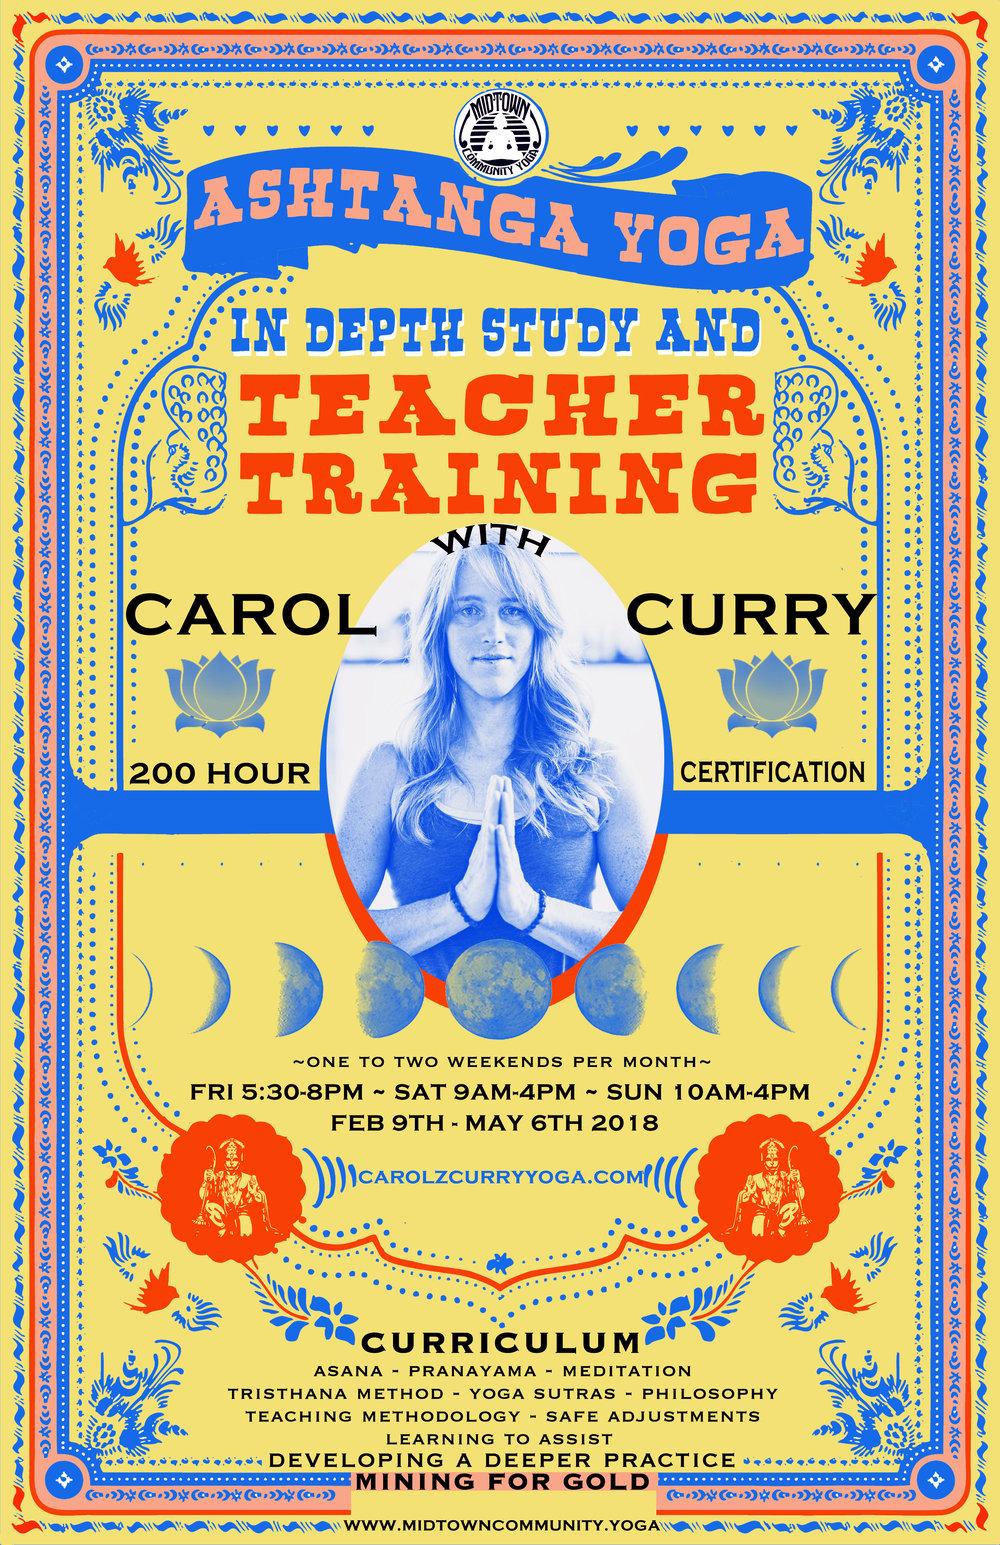 CAROLashtanga trainingspring copy.jpg